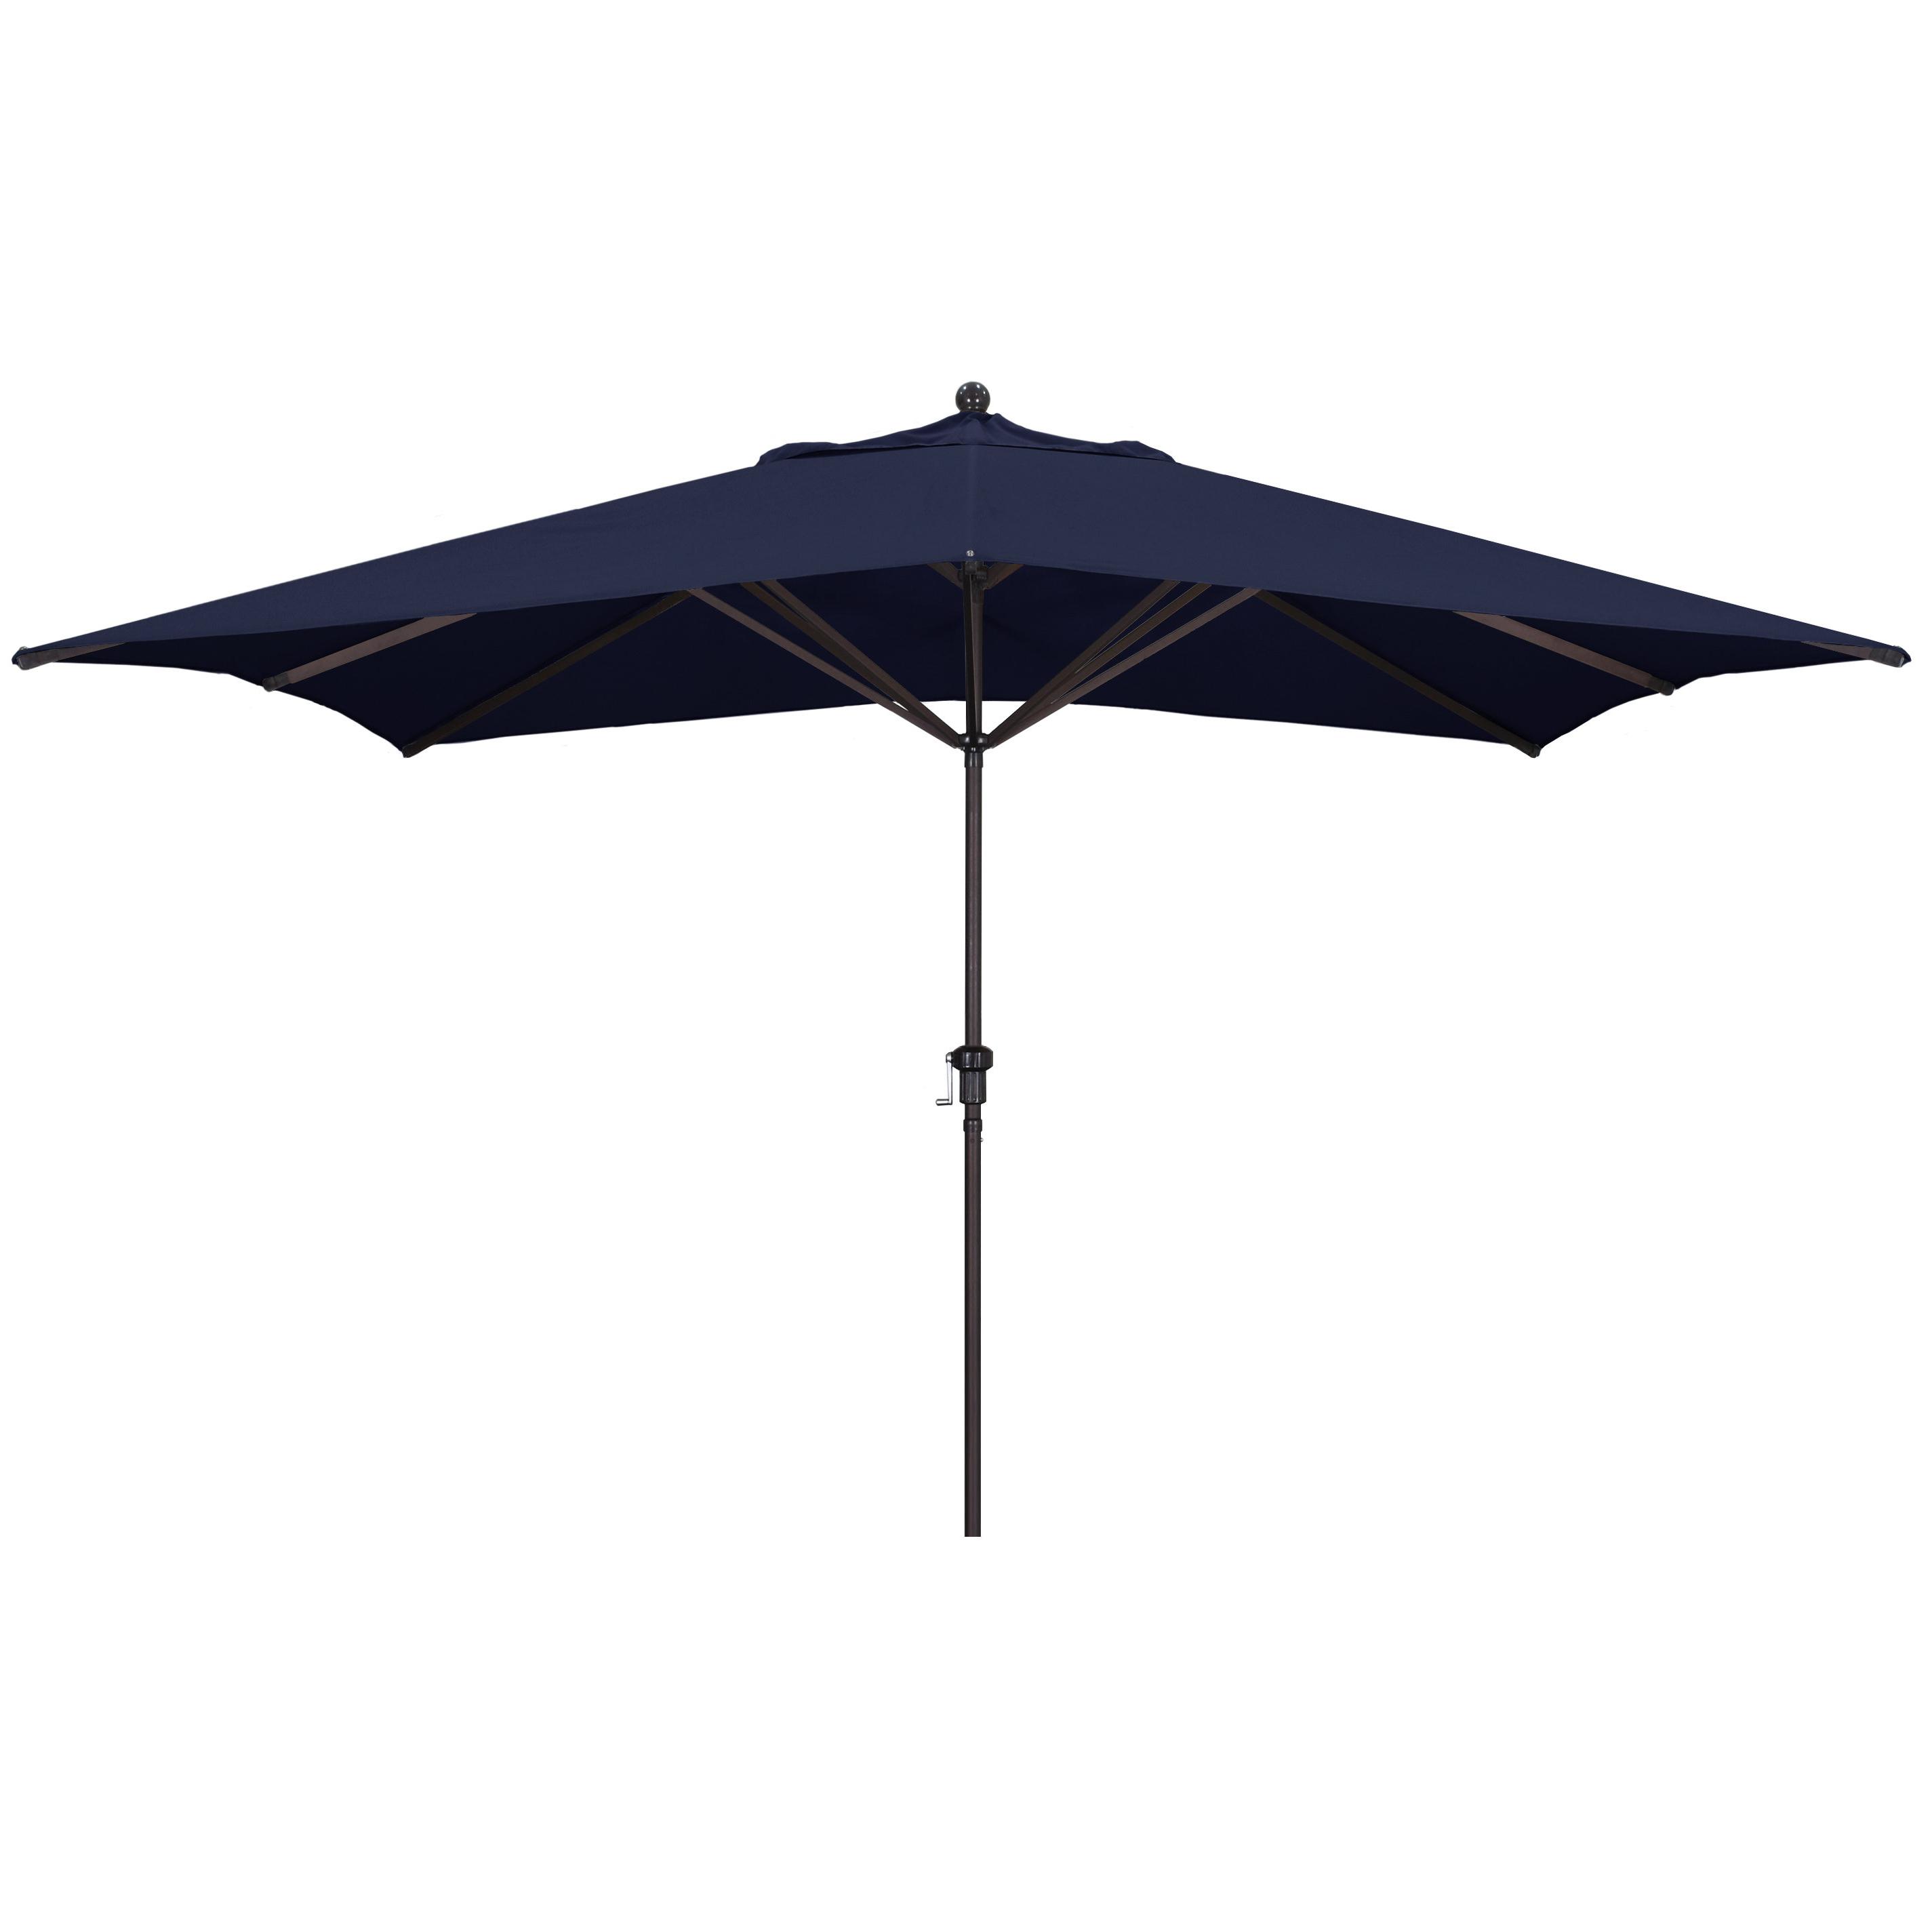 Carlton 11' X 8' Rectangular Market Umbrella With Regard To Favorite Launceston Market Umbrellas (View 11 of 20)